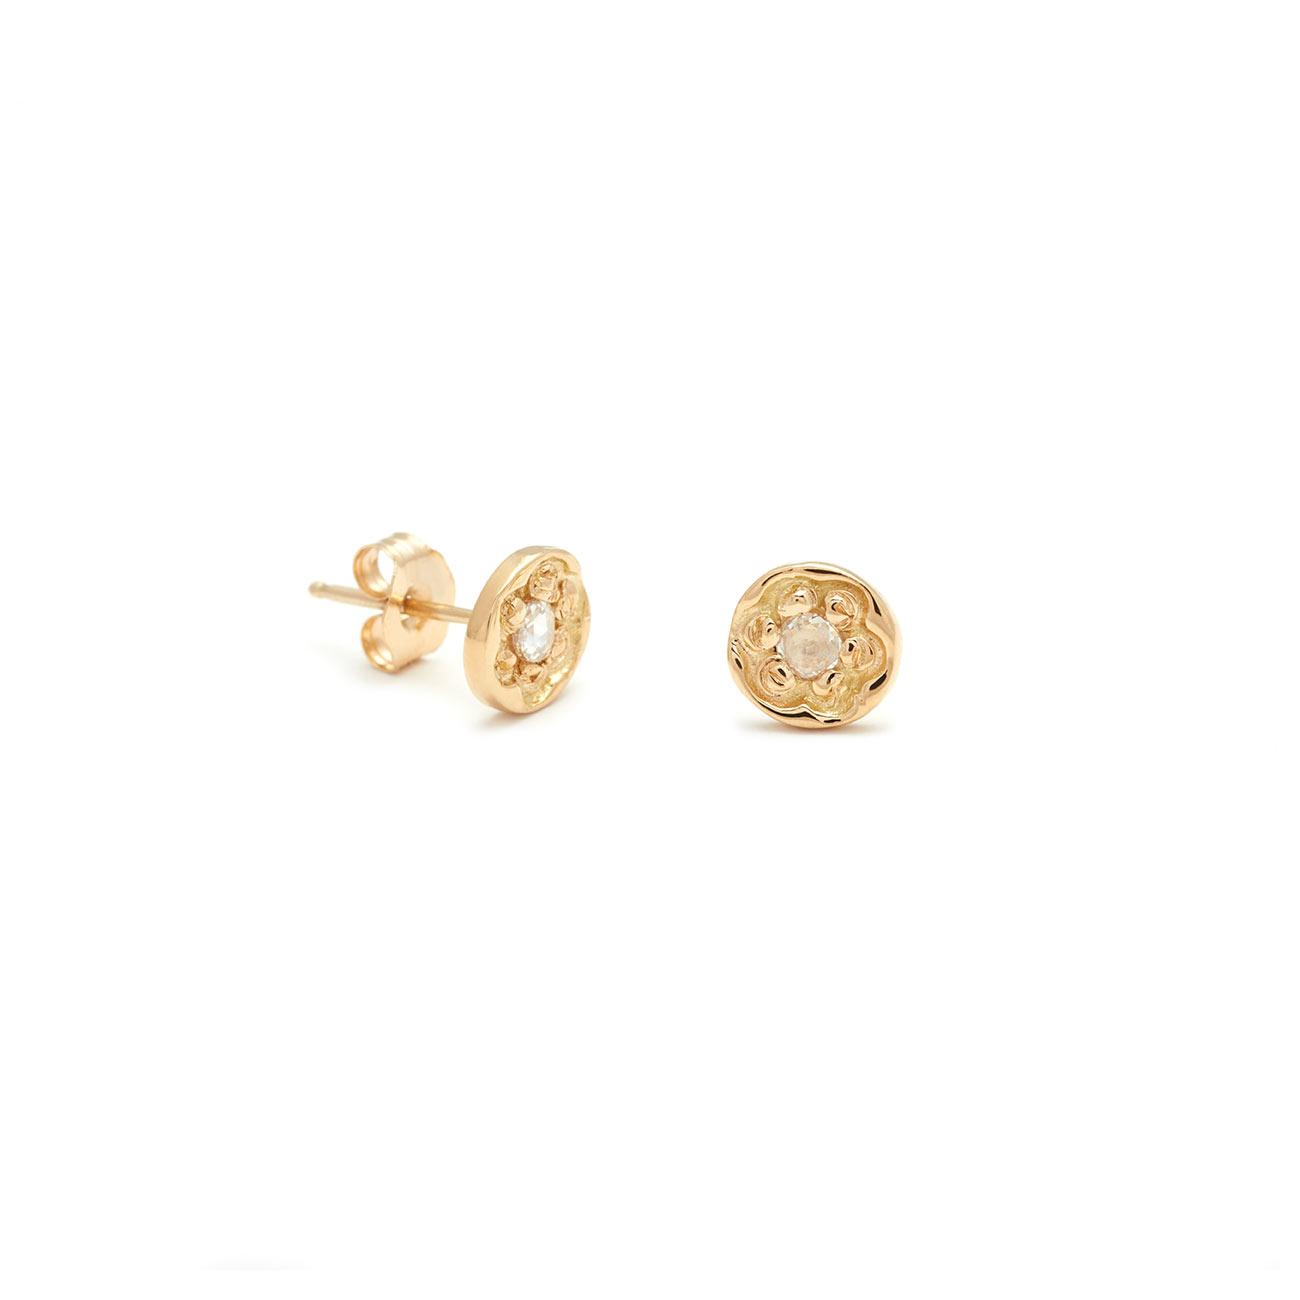 Yellow Gold Flower Disk Stud Earrings